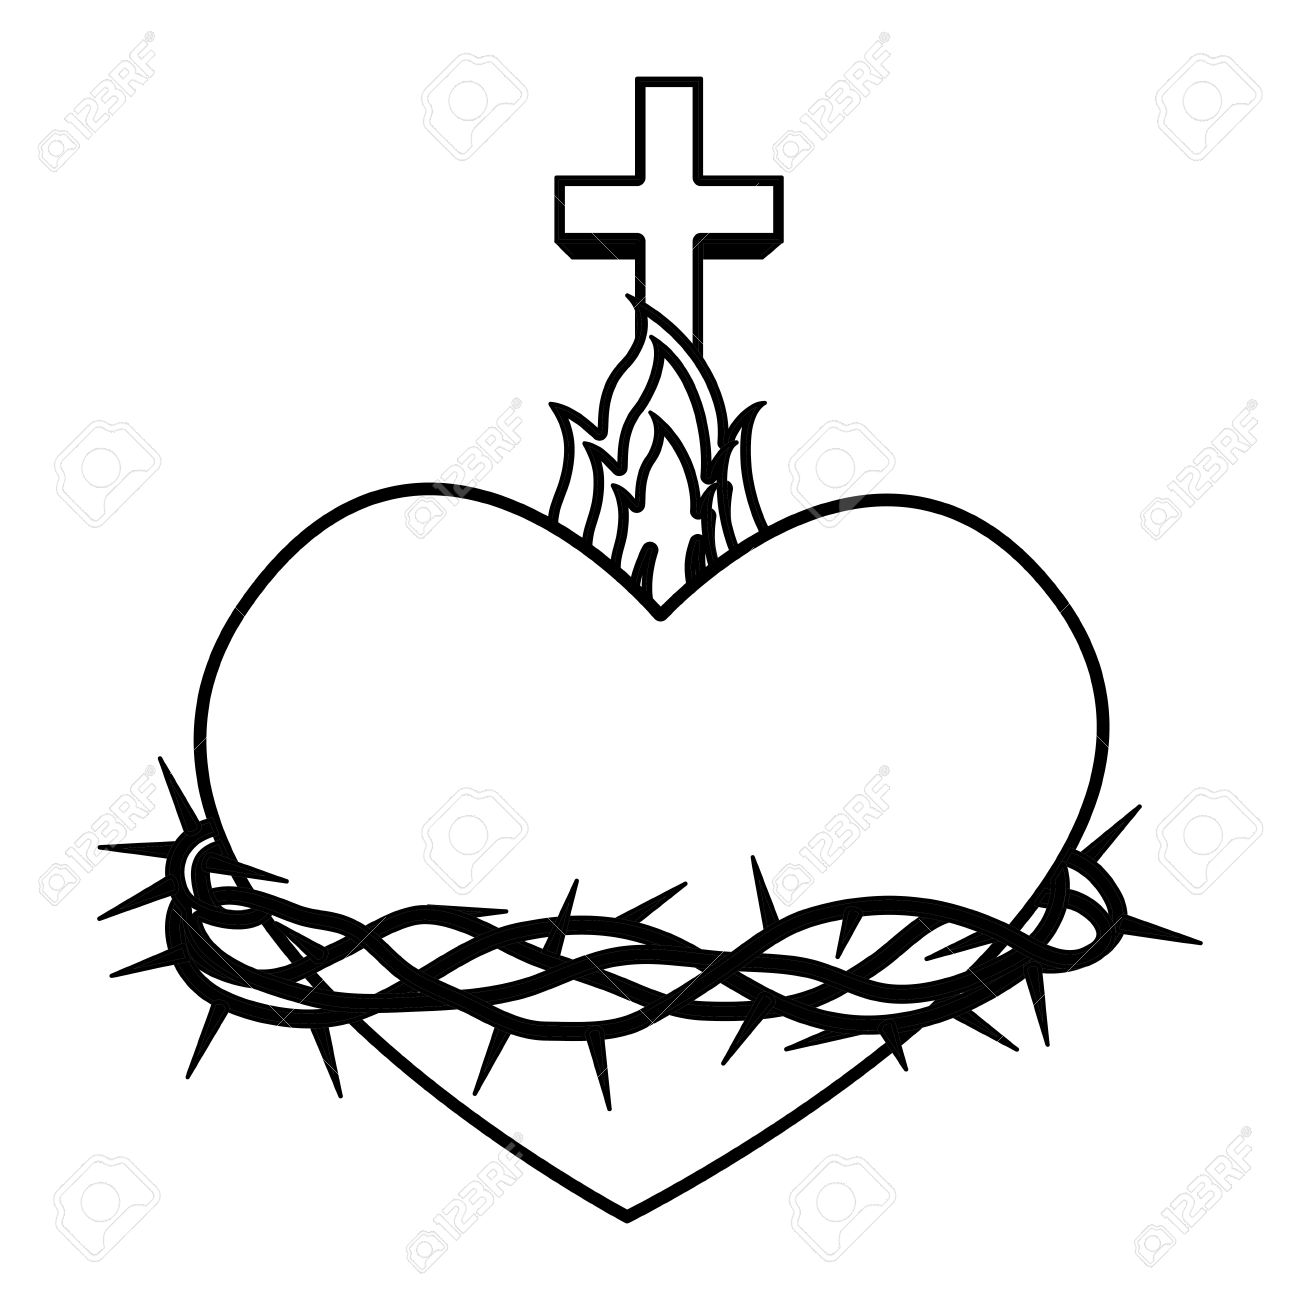 hight resolution of sacred heart of jesus vector illustration design stock vector 66752173